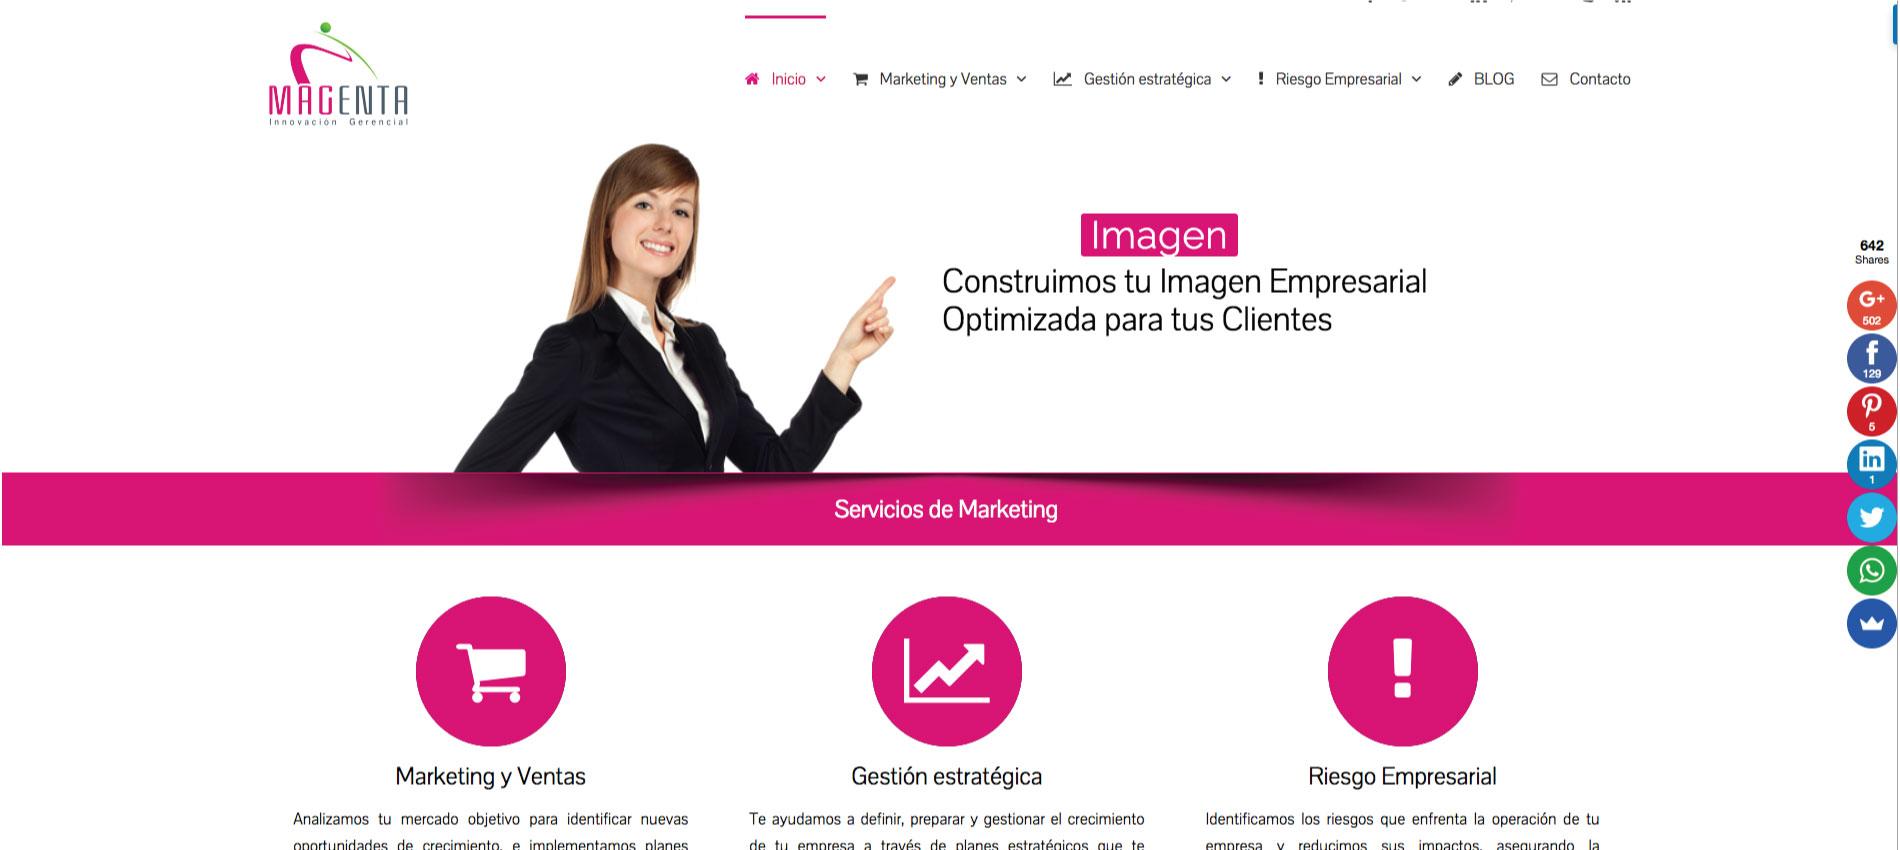 desarrollo web freelance